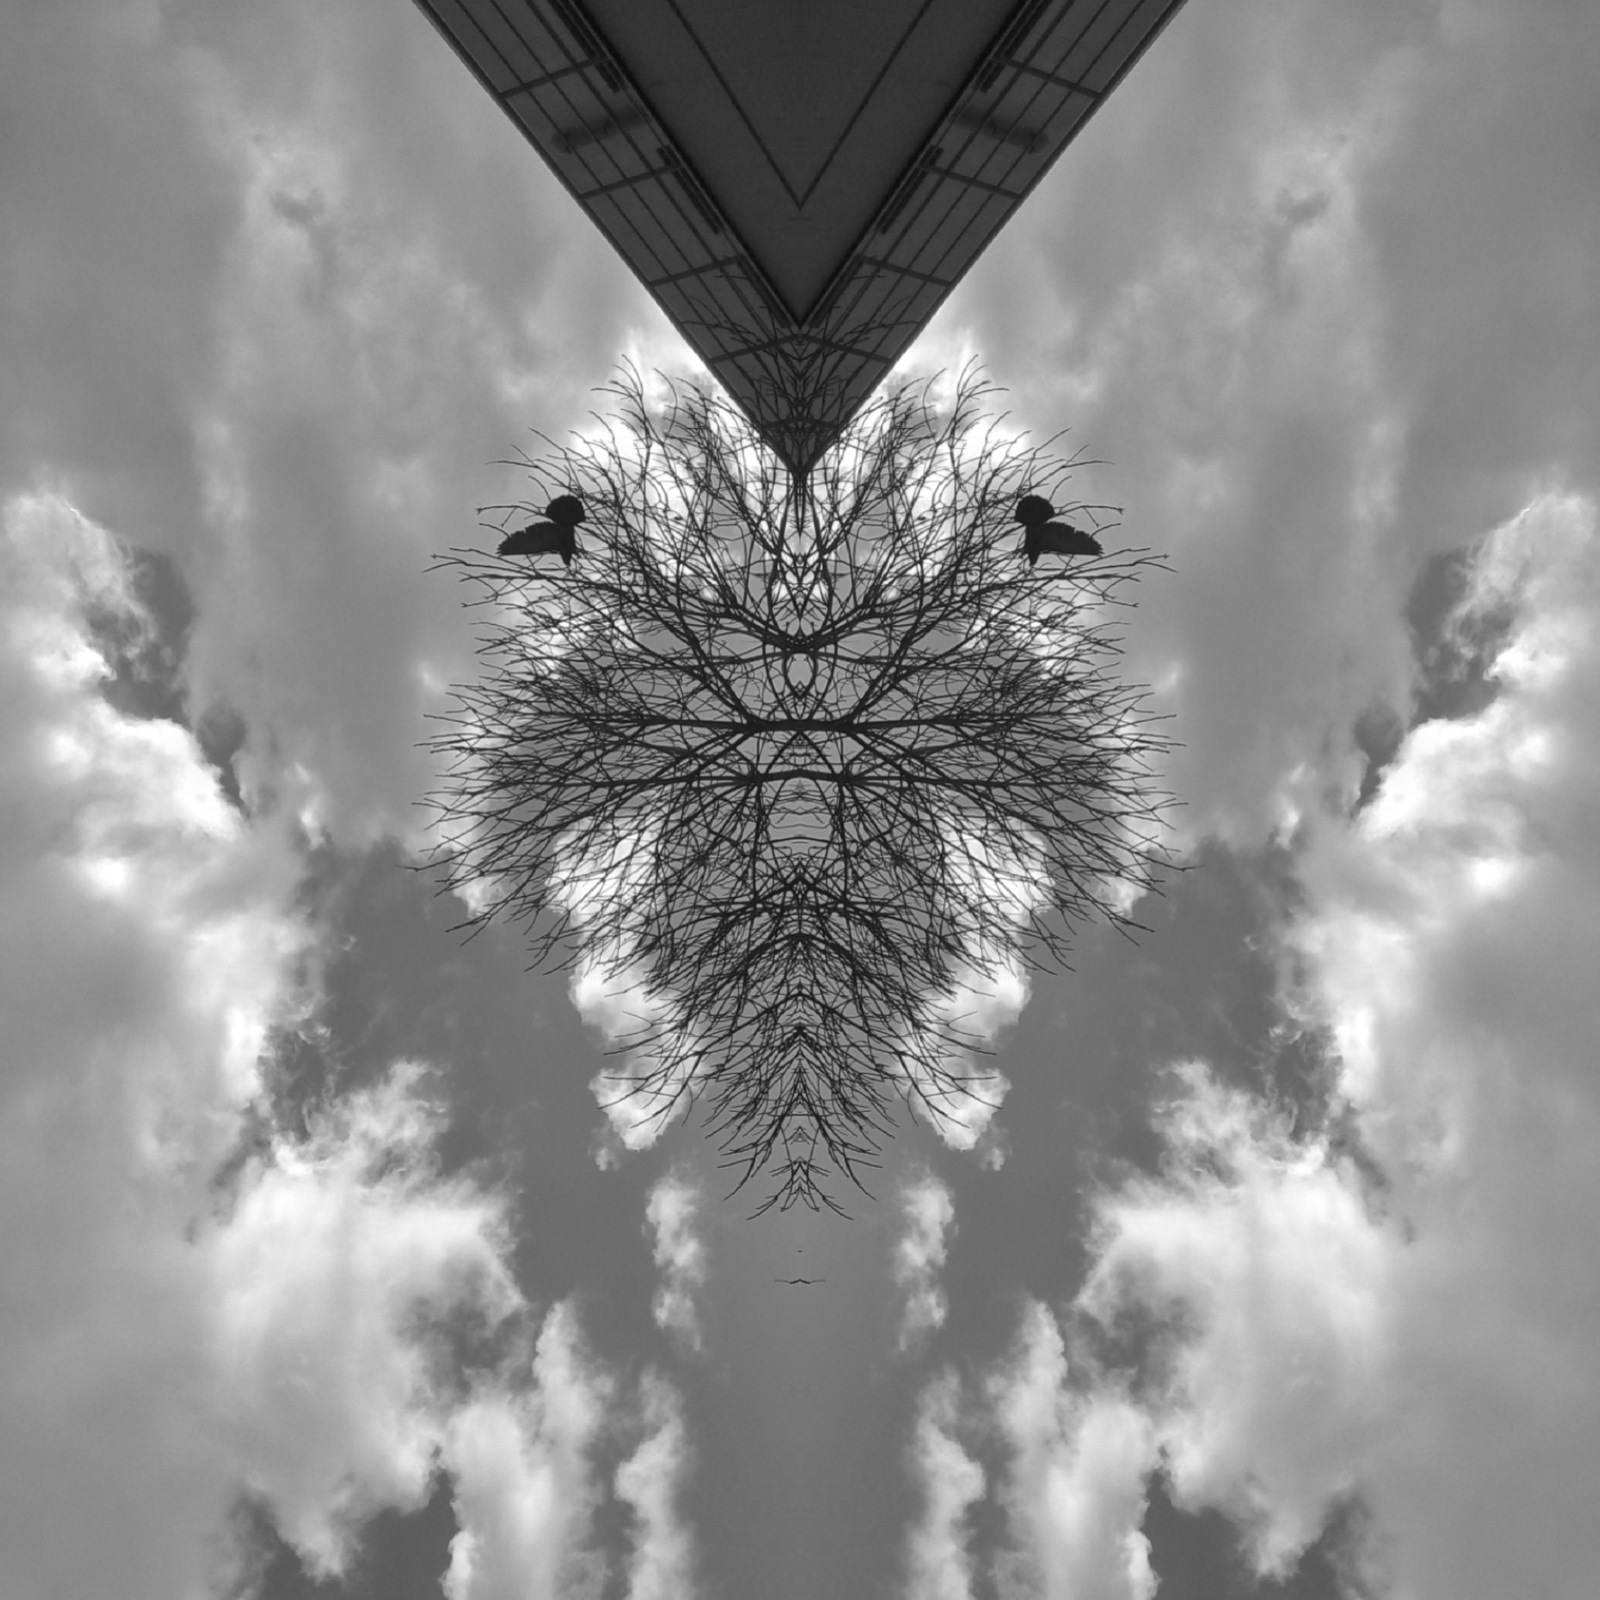 Untitled by Dream0graphy Bairaktaris Theodoros